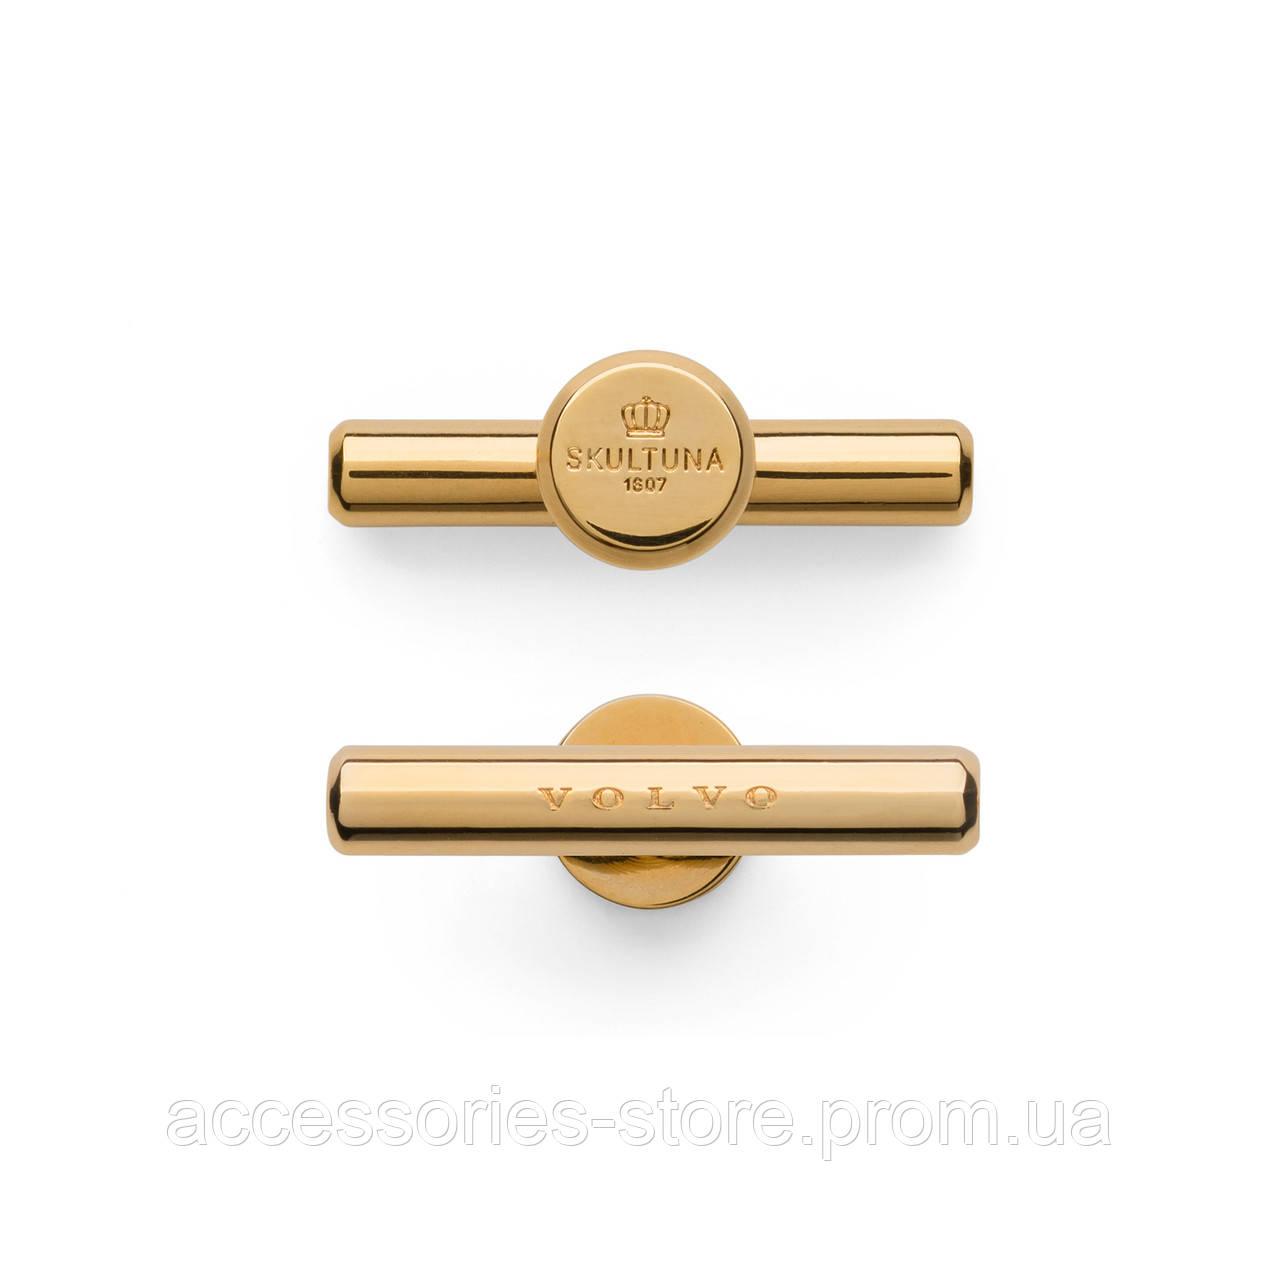 Запонки золотые Volvo, Cufflinks Gold  by Skultuna